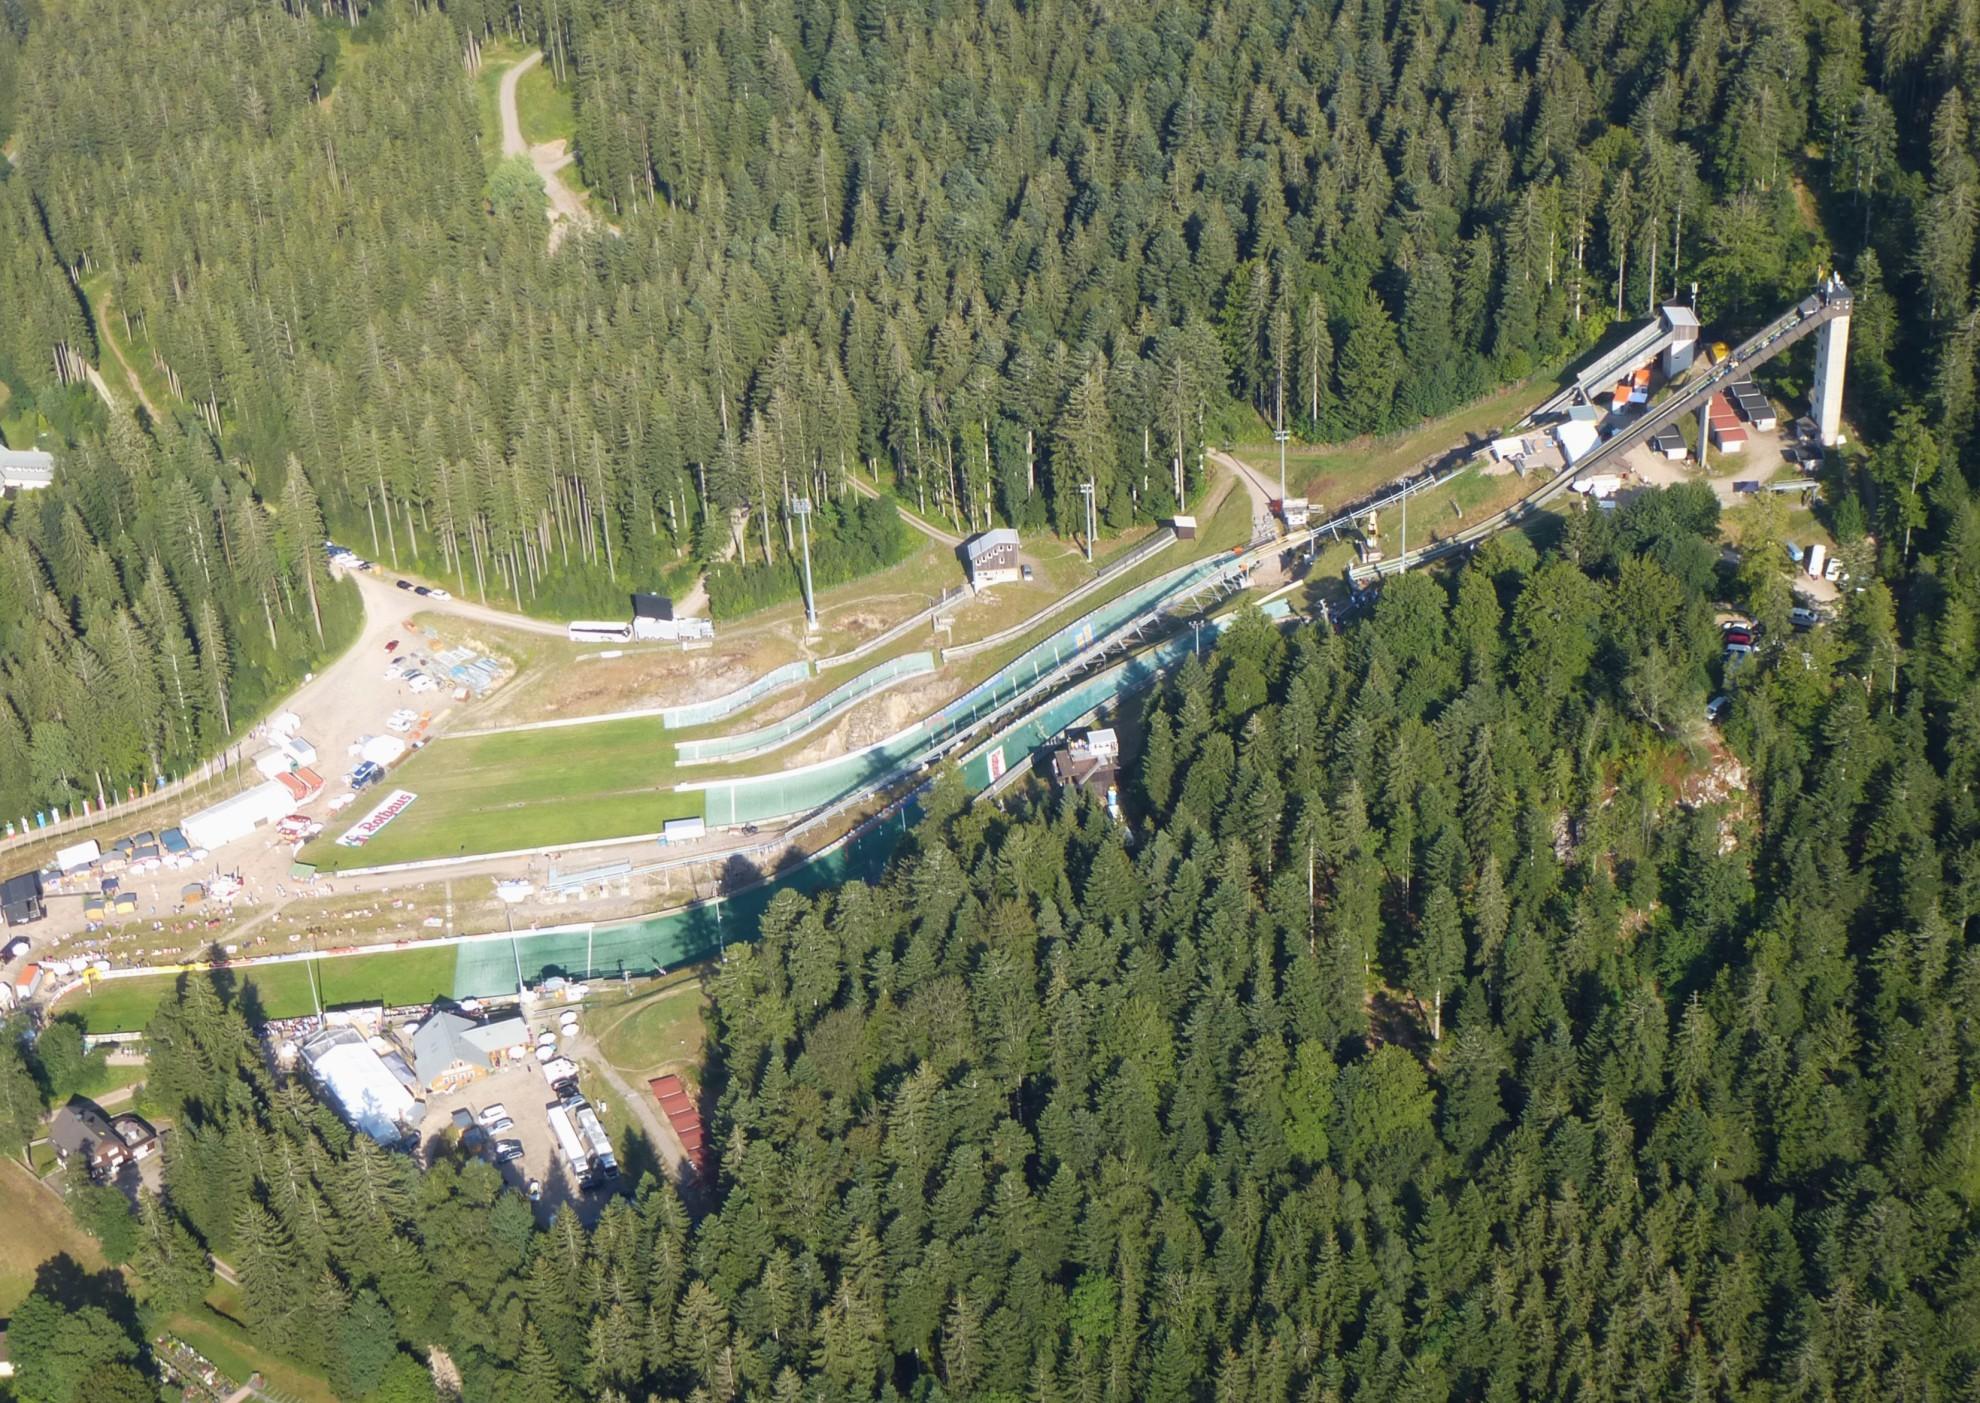 Luftbild Adler-Skistadion Sommer